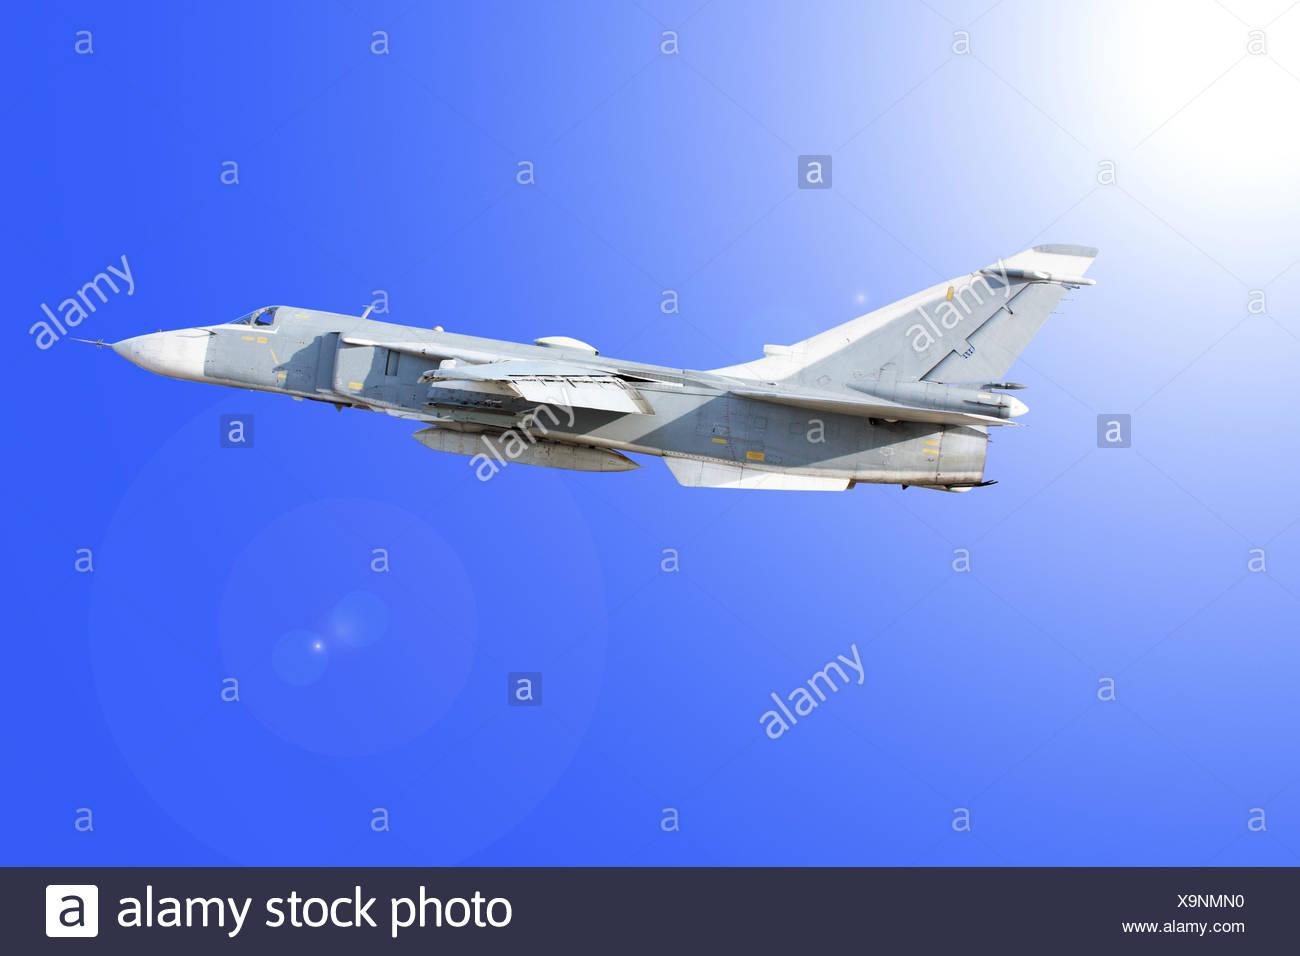 Military jet bomber Su-24 - Stock Image